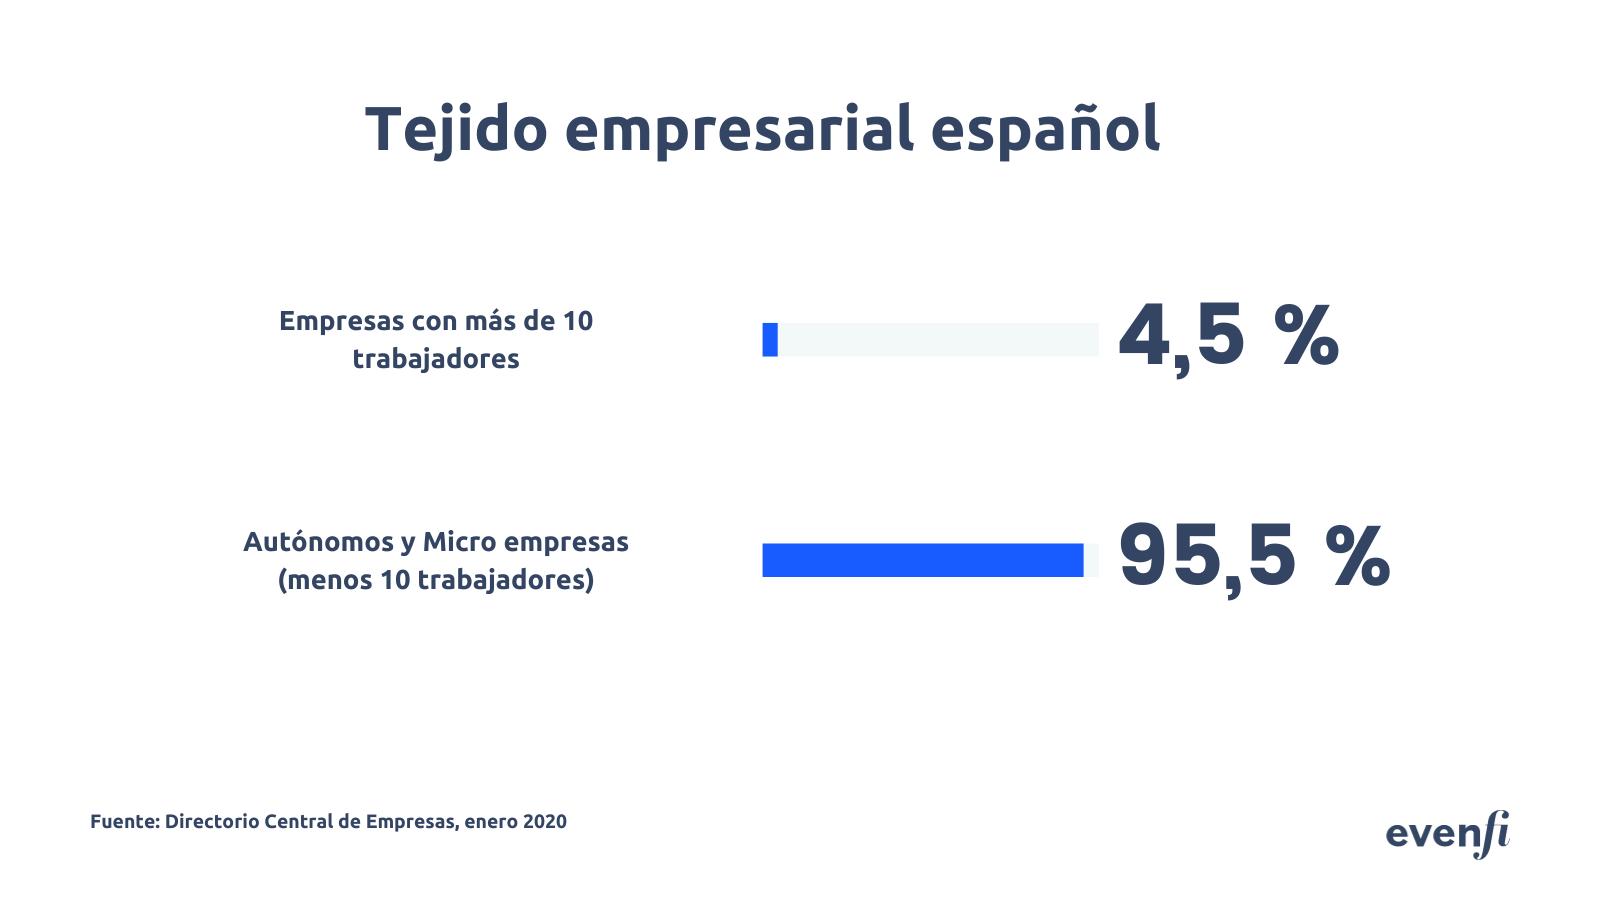 Fotografia Tejido empresarial español